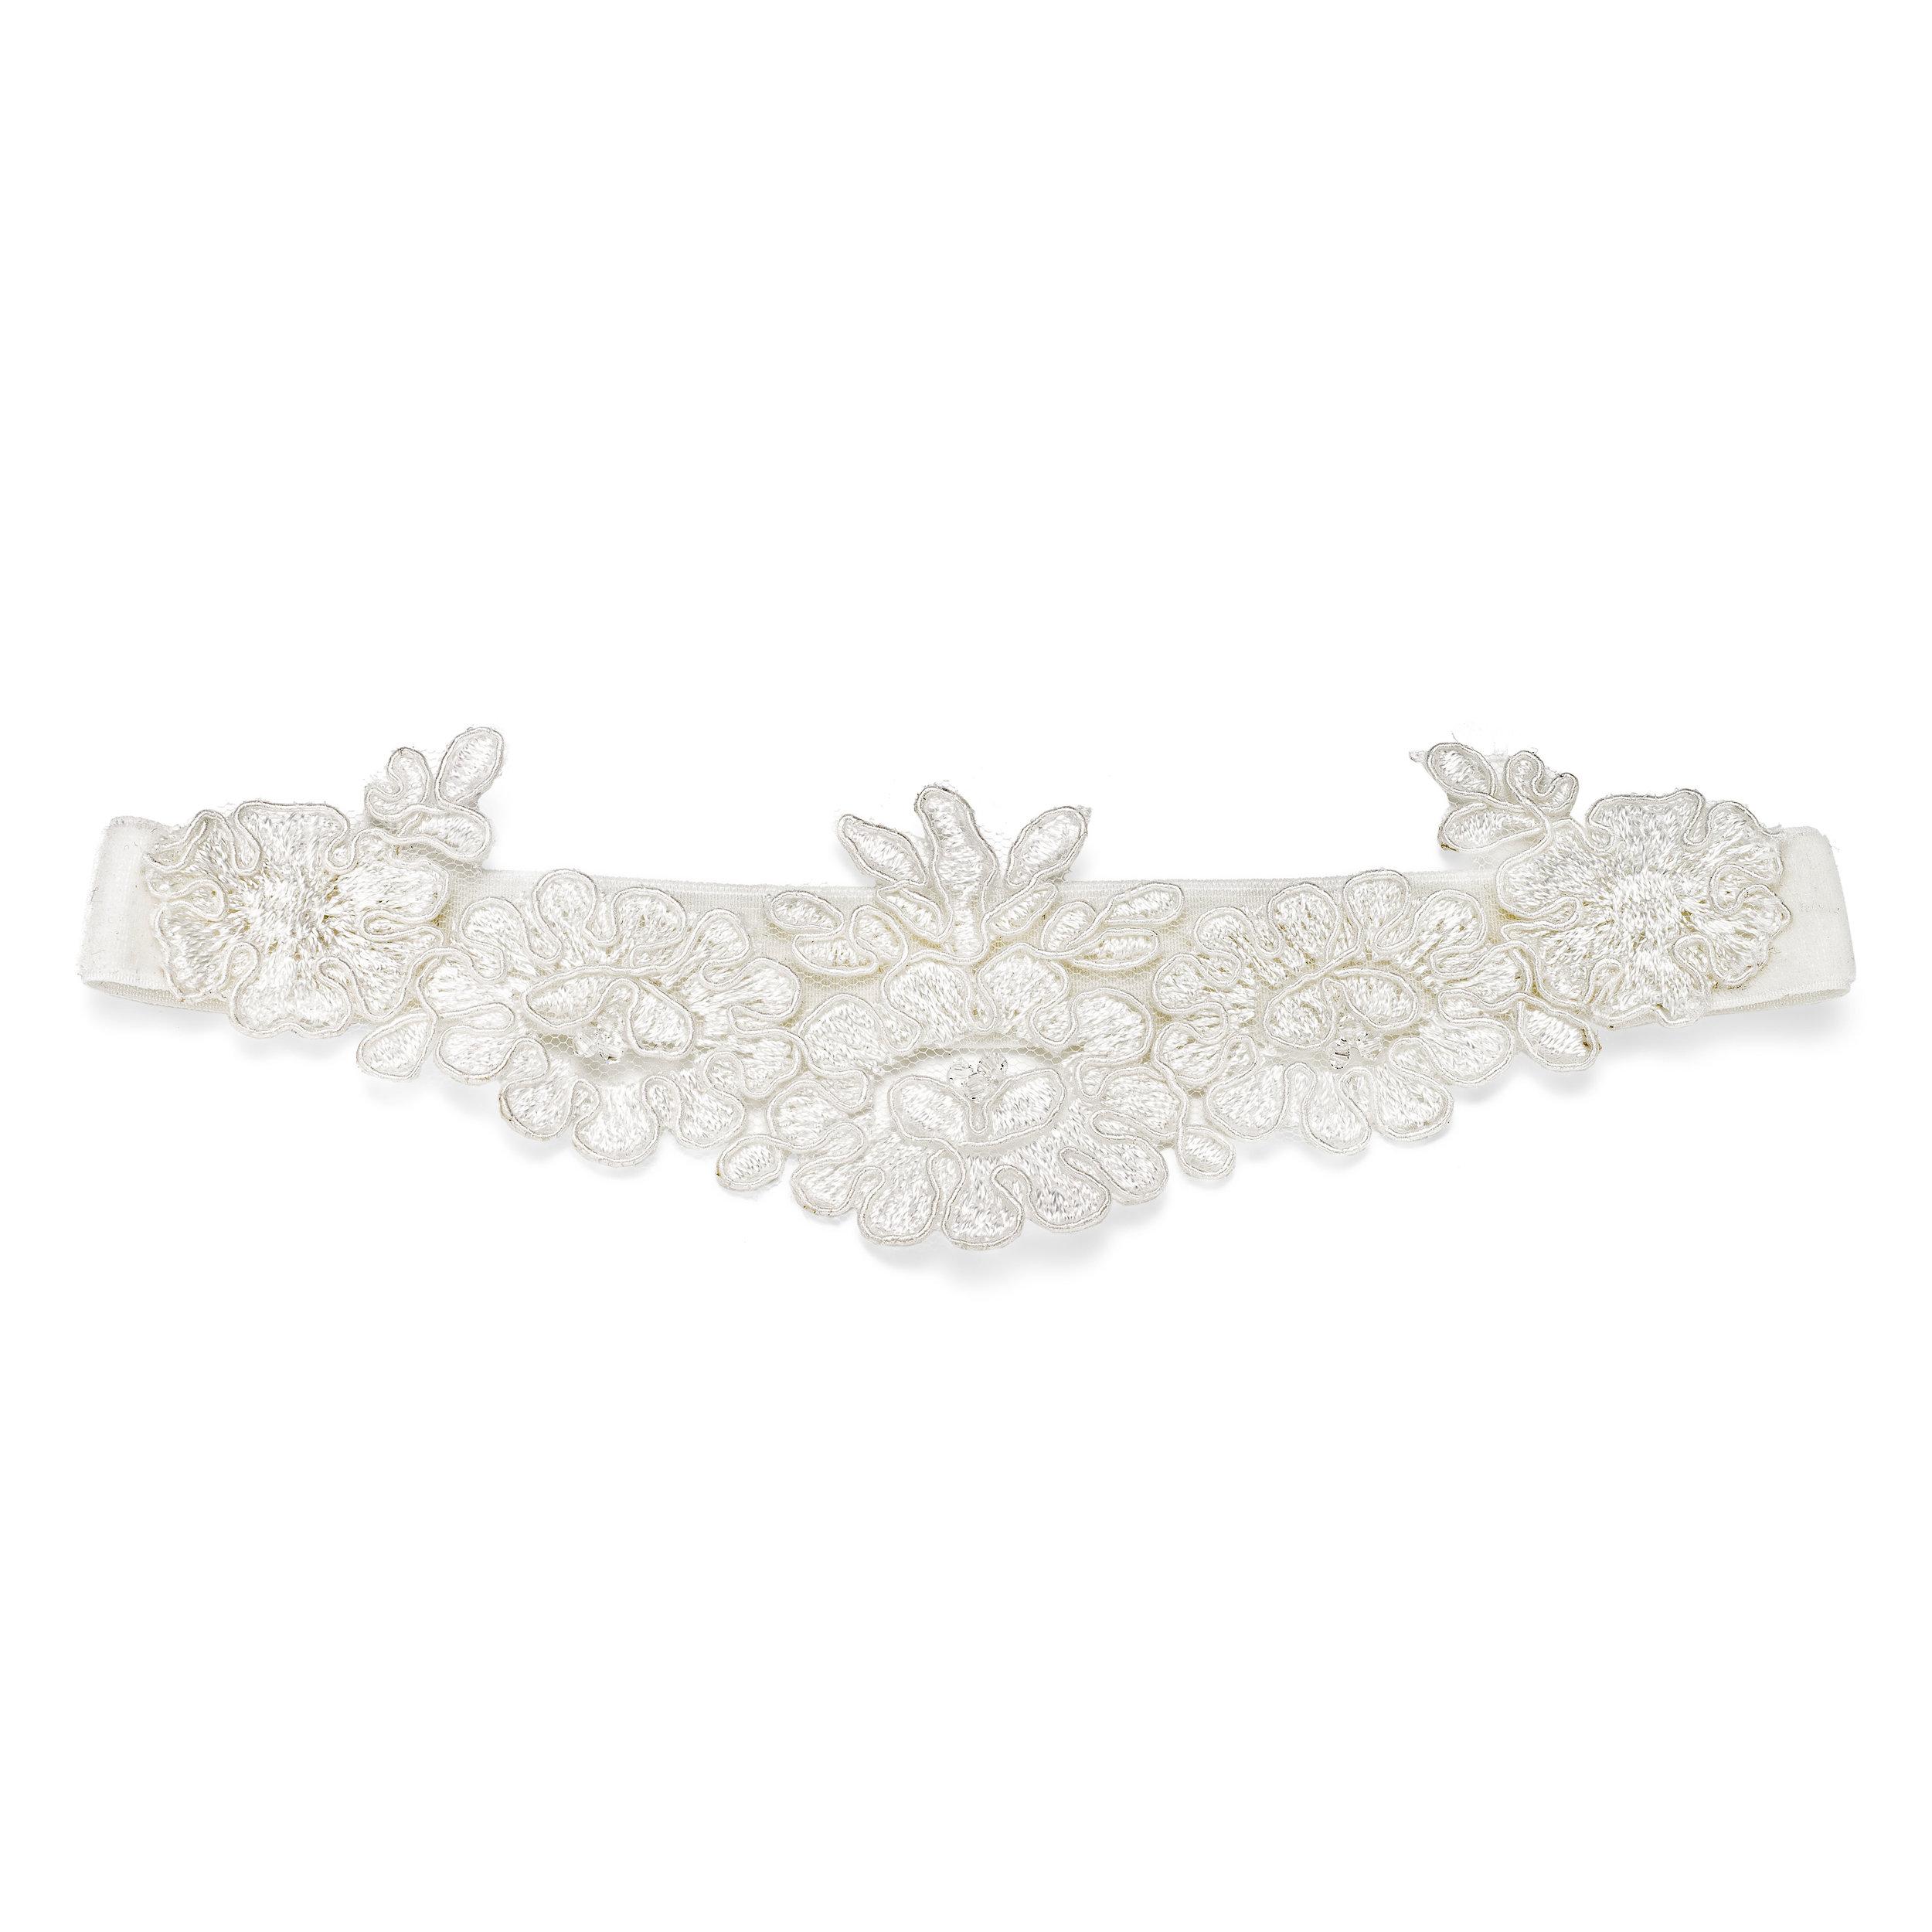 French lace and velvet wedding garter